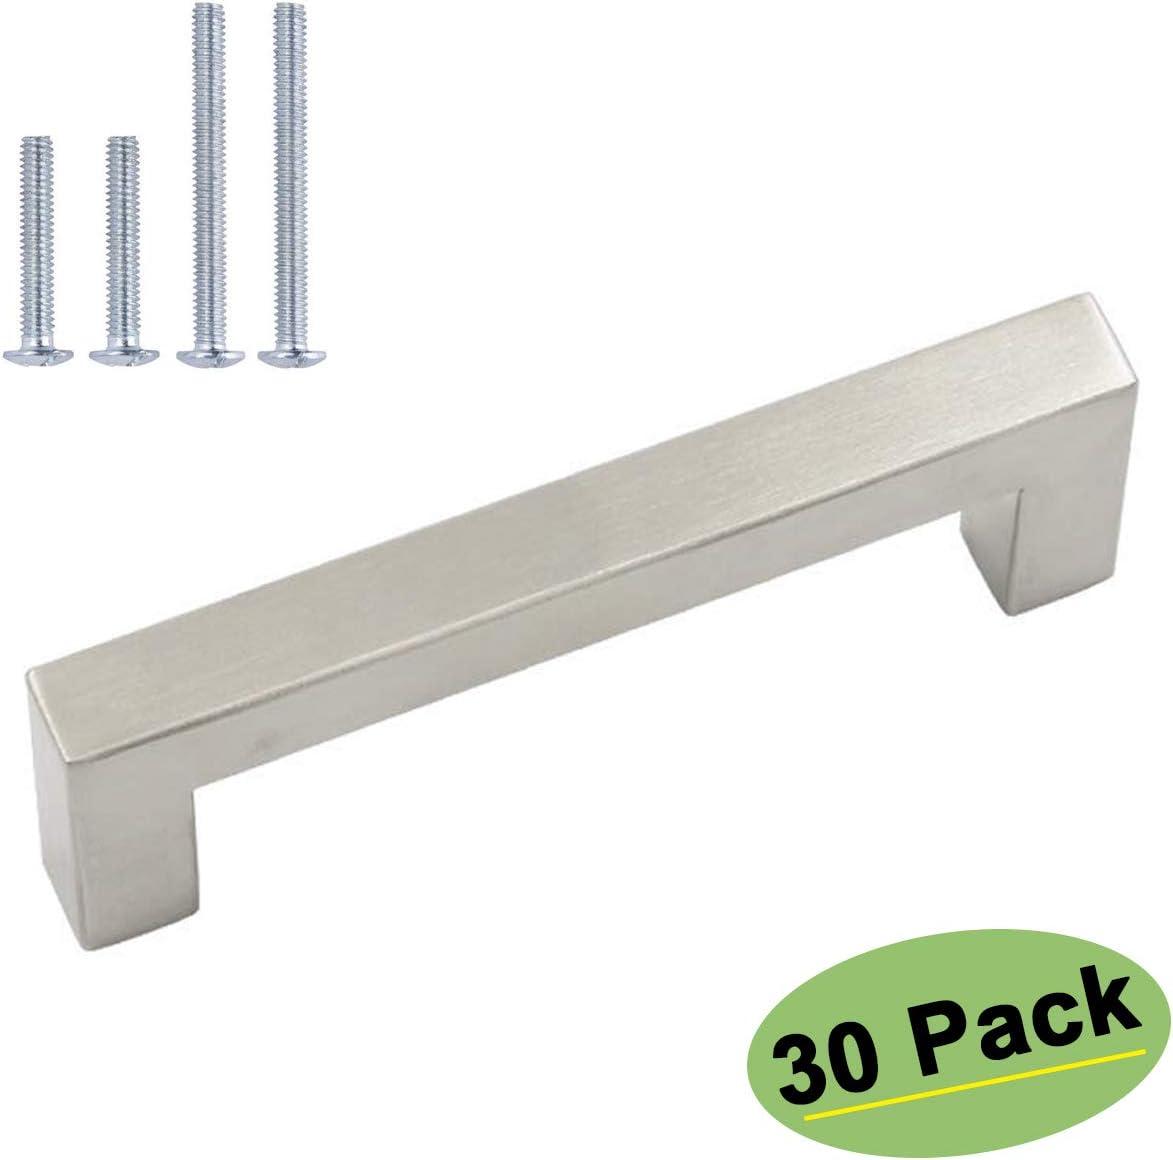 (30 Pack) homdiy Kitchen Cabinet Handles Modern Drawer Pulls - HDJ12SN Cabinet Hardware Stainless Steel Cabinet Pulls Cabinet Door Handles, 5in Hole Centers Pulls for Dresser Drawers